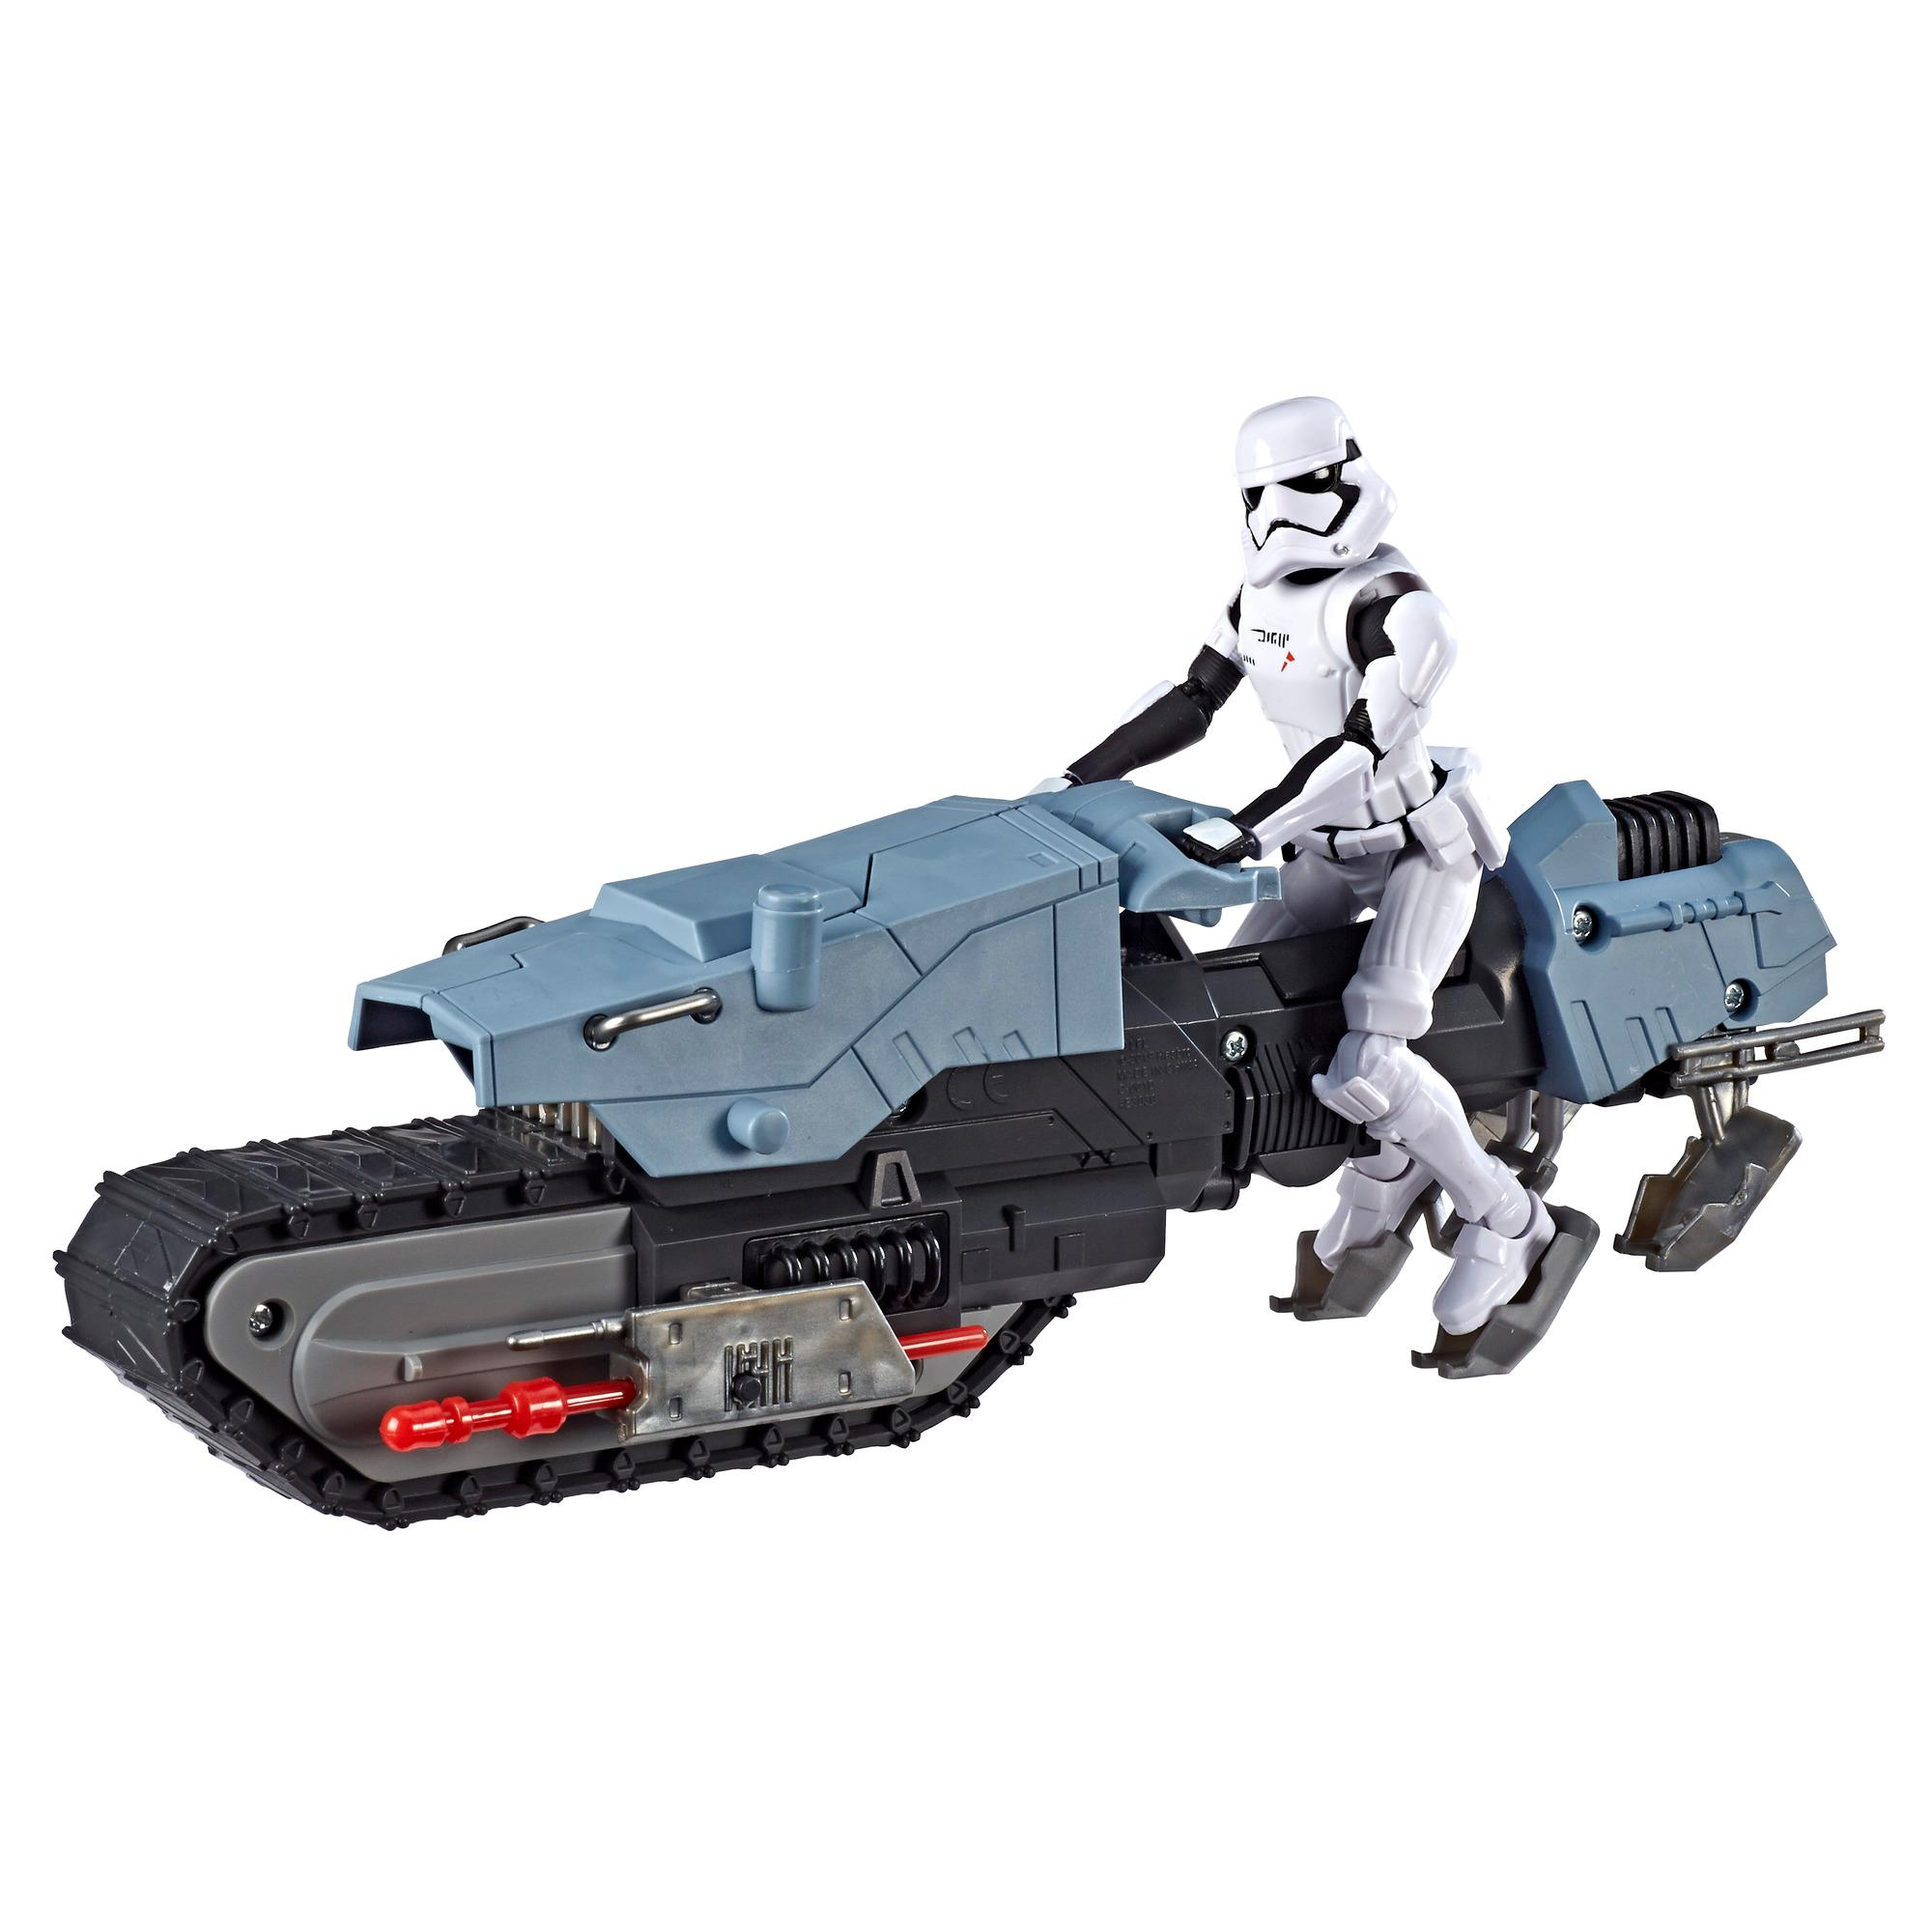 Star Wars Galaxy of Adventures First Order Driver and Treadspeeder